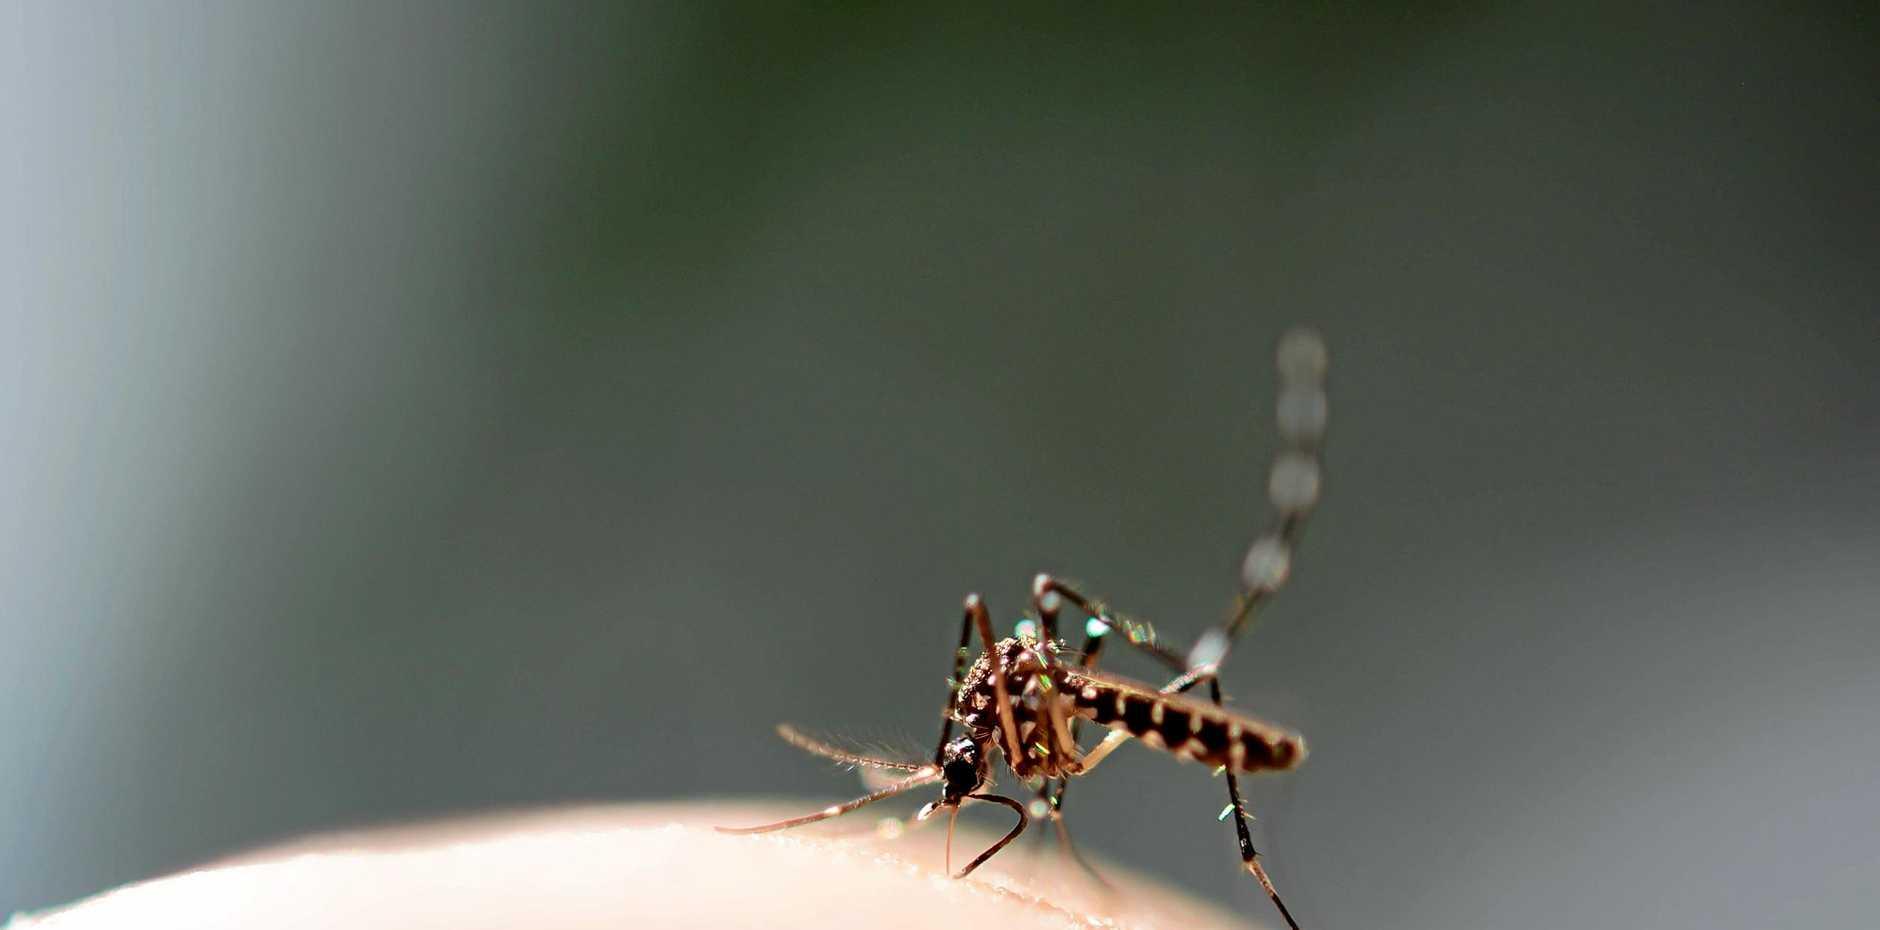 Council advises on how to prevent dengue fever.